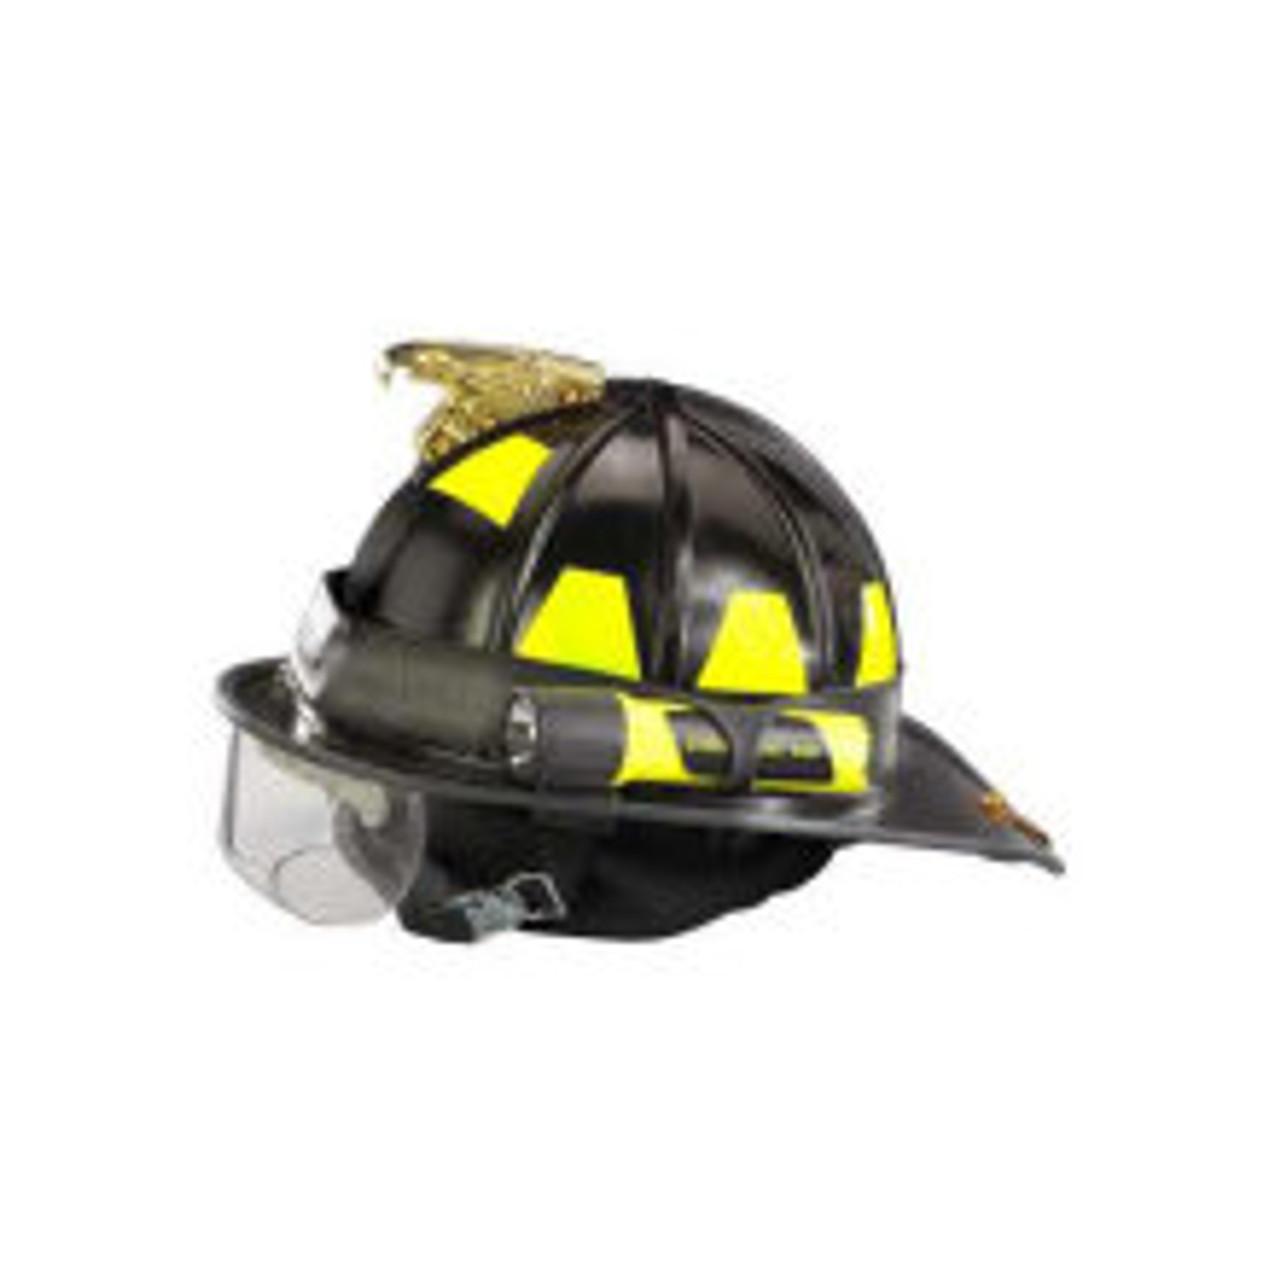 Streamlight Rubber Helmet Strap